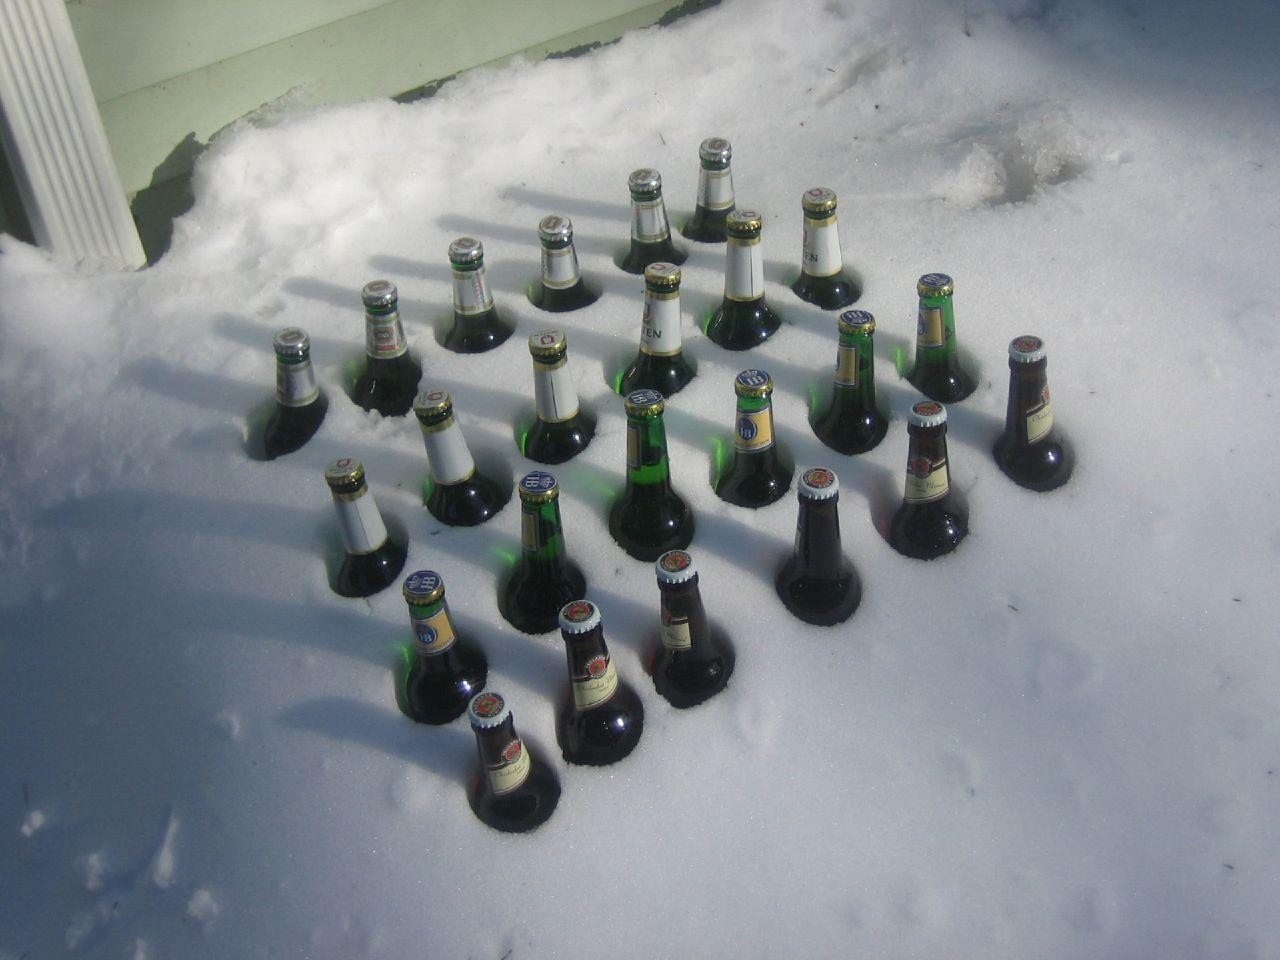 Balcony beer prep is essential